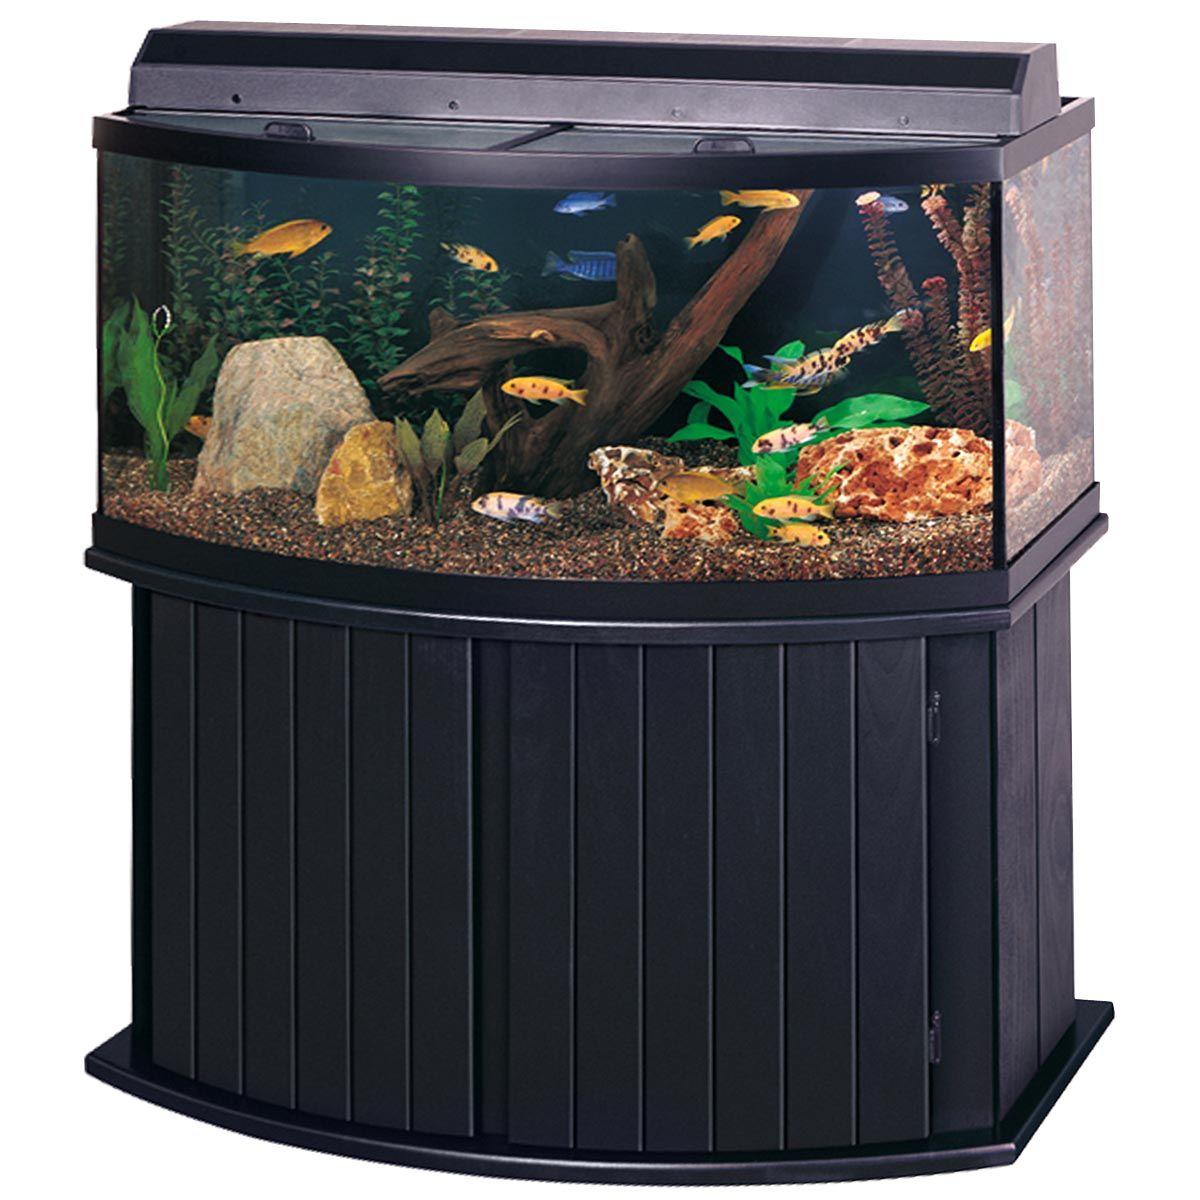 100 gallon glass bow front aquarium aquarium ideas for 100 gallon fish tank stand